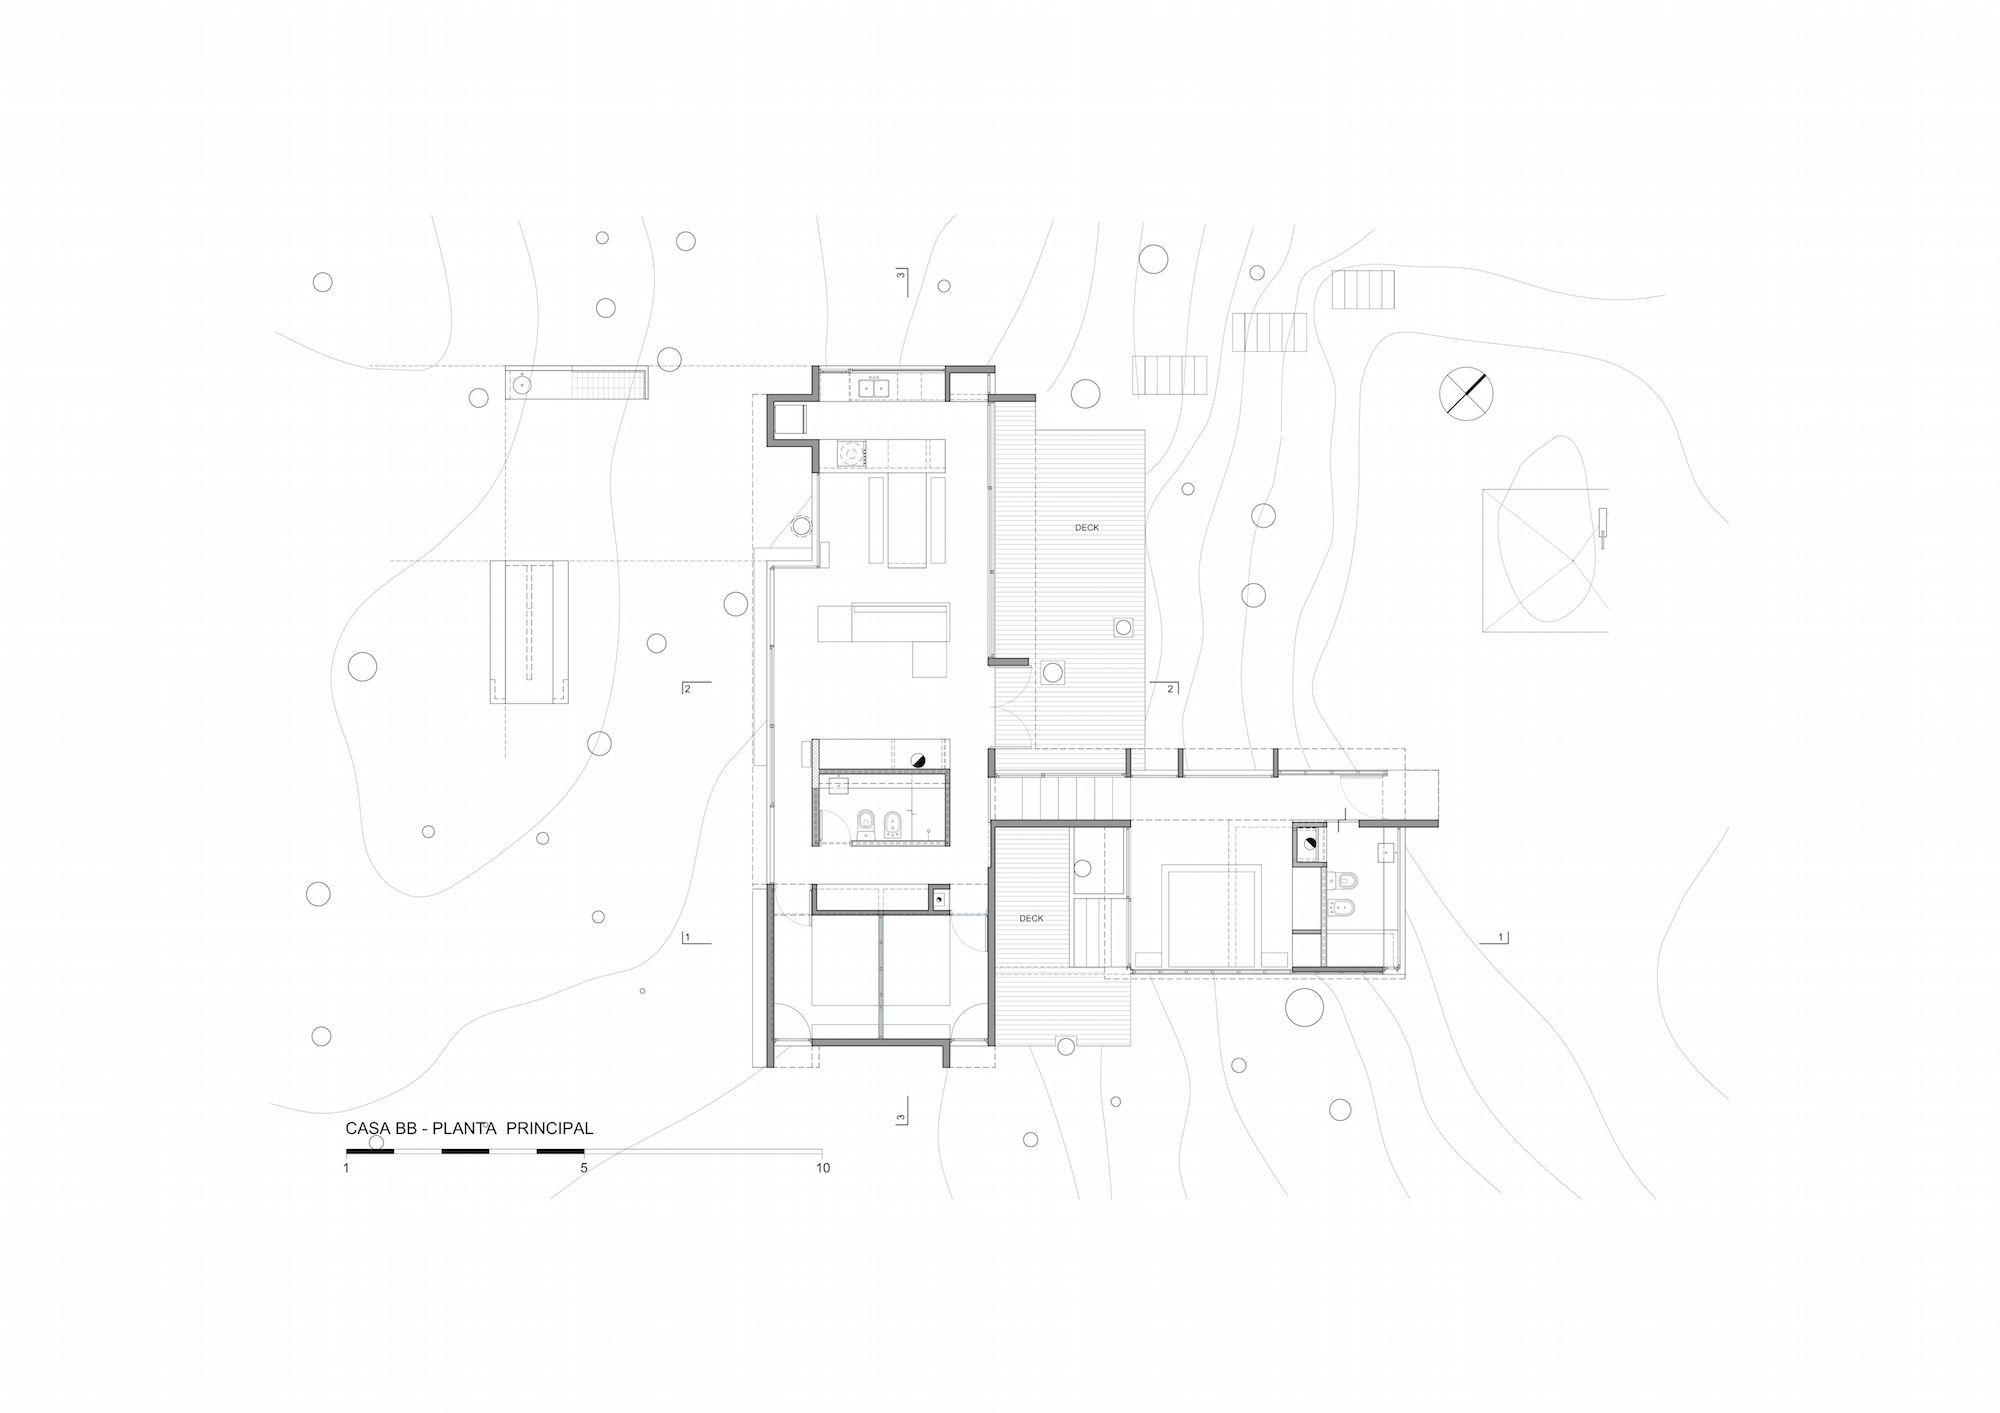 Casa BB - Planta Principal